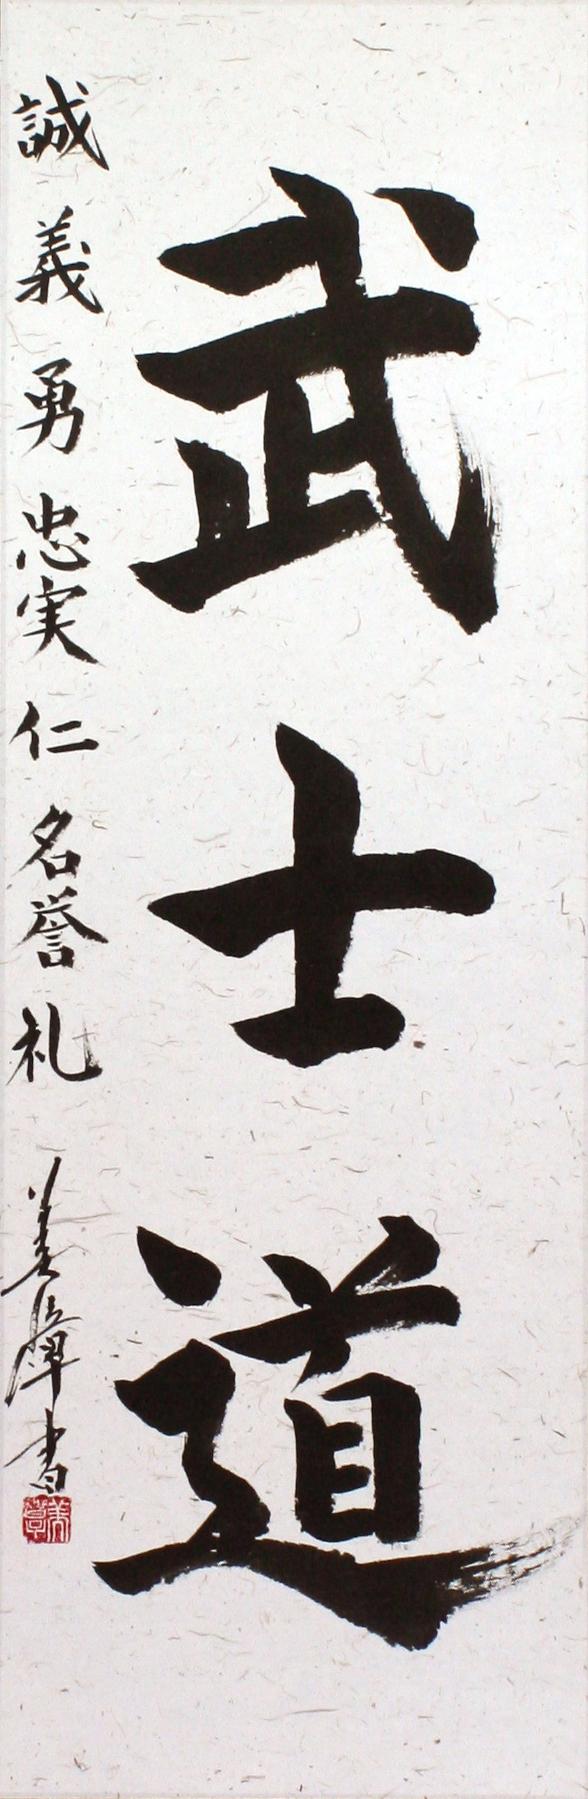 bushido_calligraphy.jpg